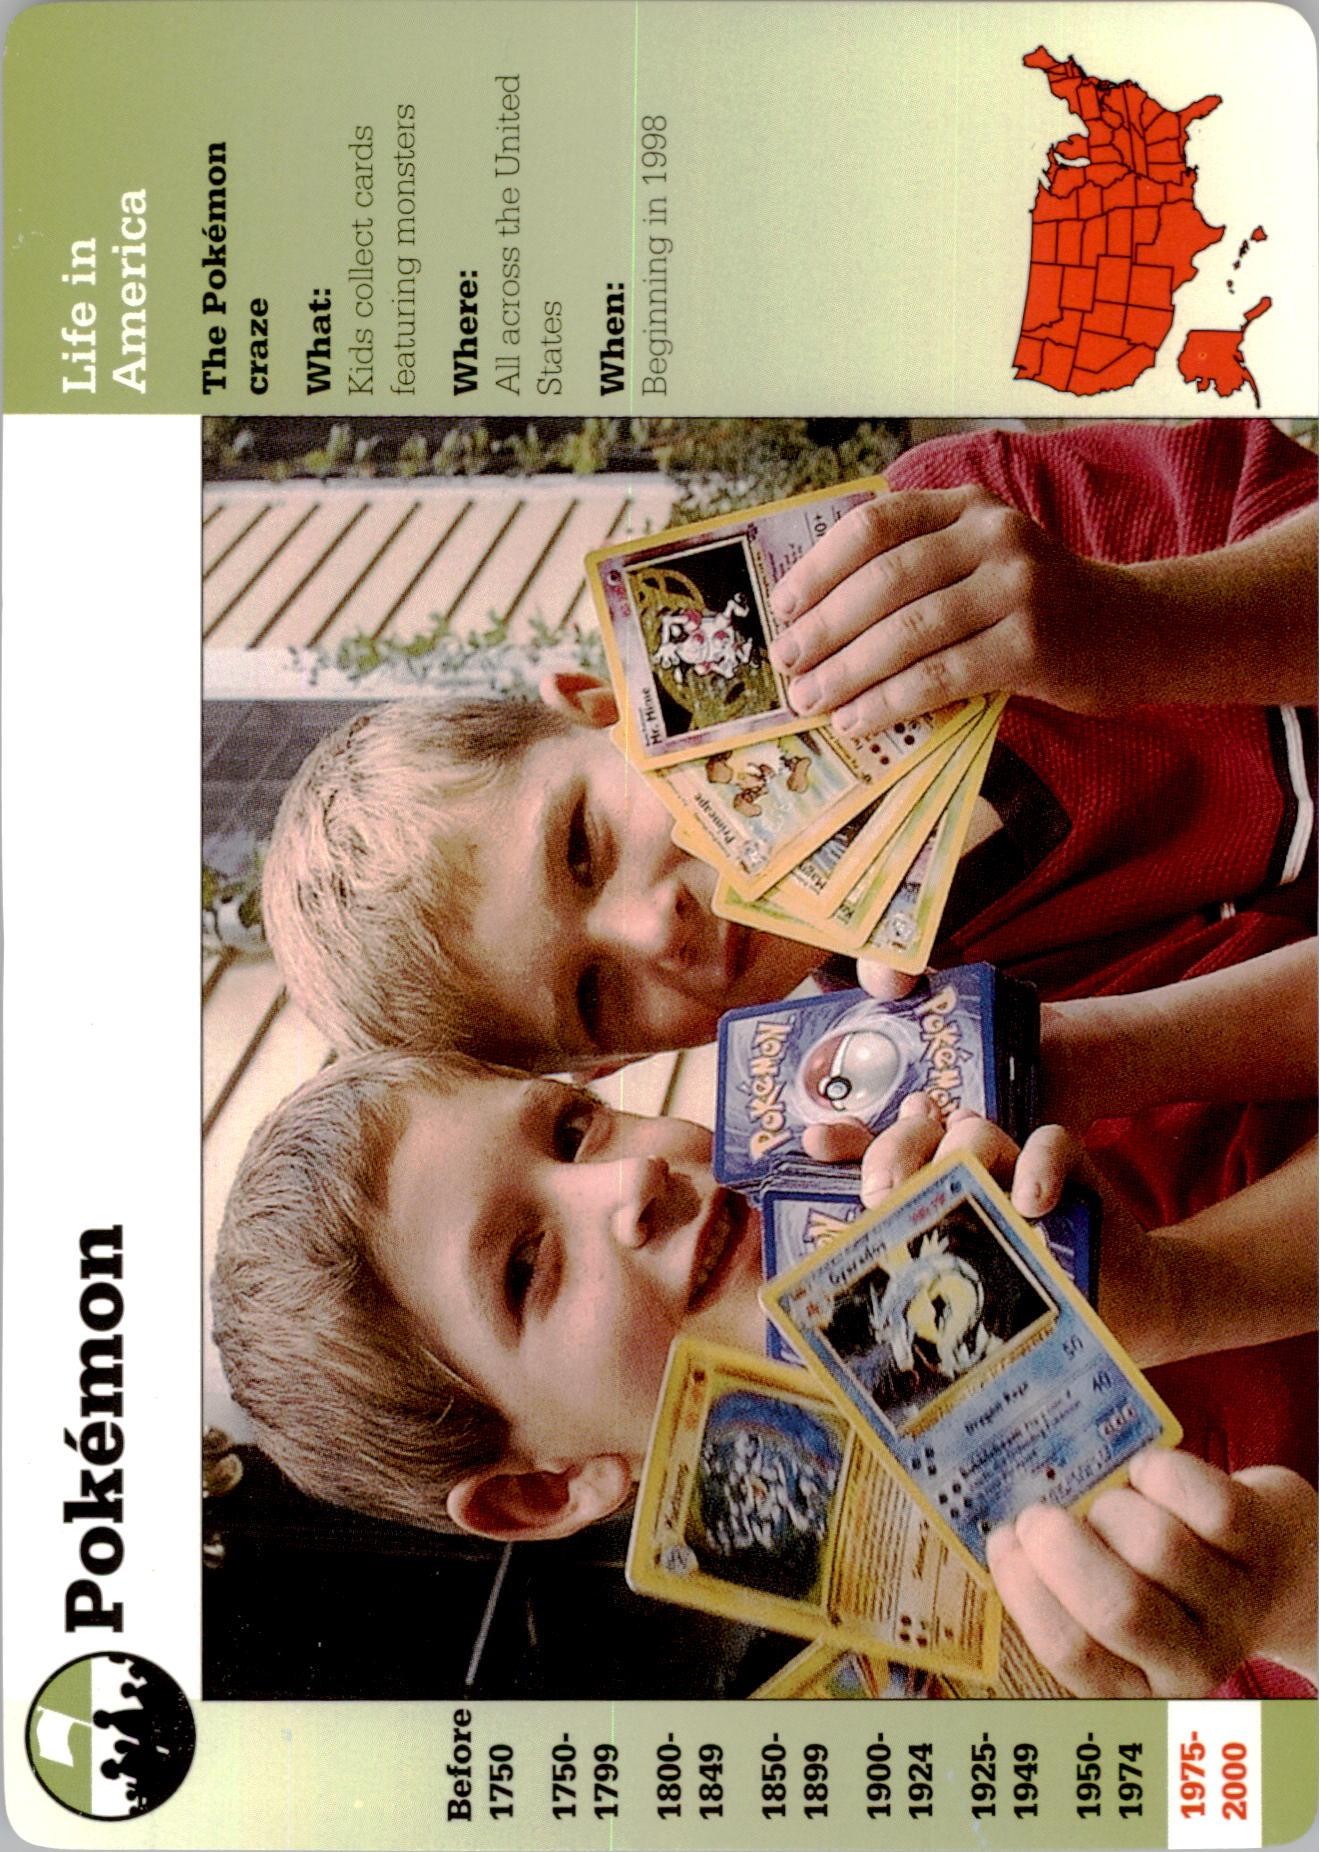 1994-01 Story of America #131-5 Pokemon